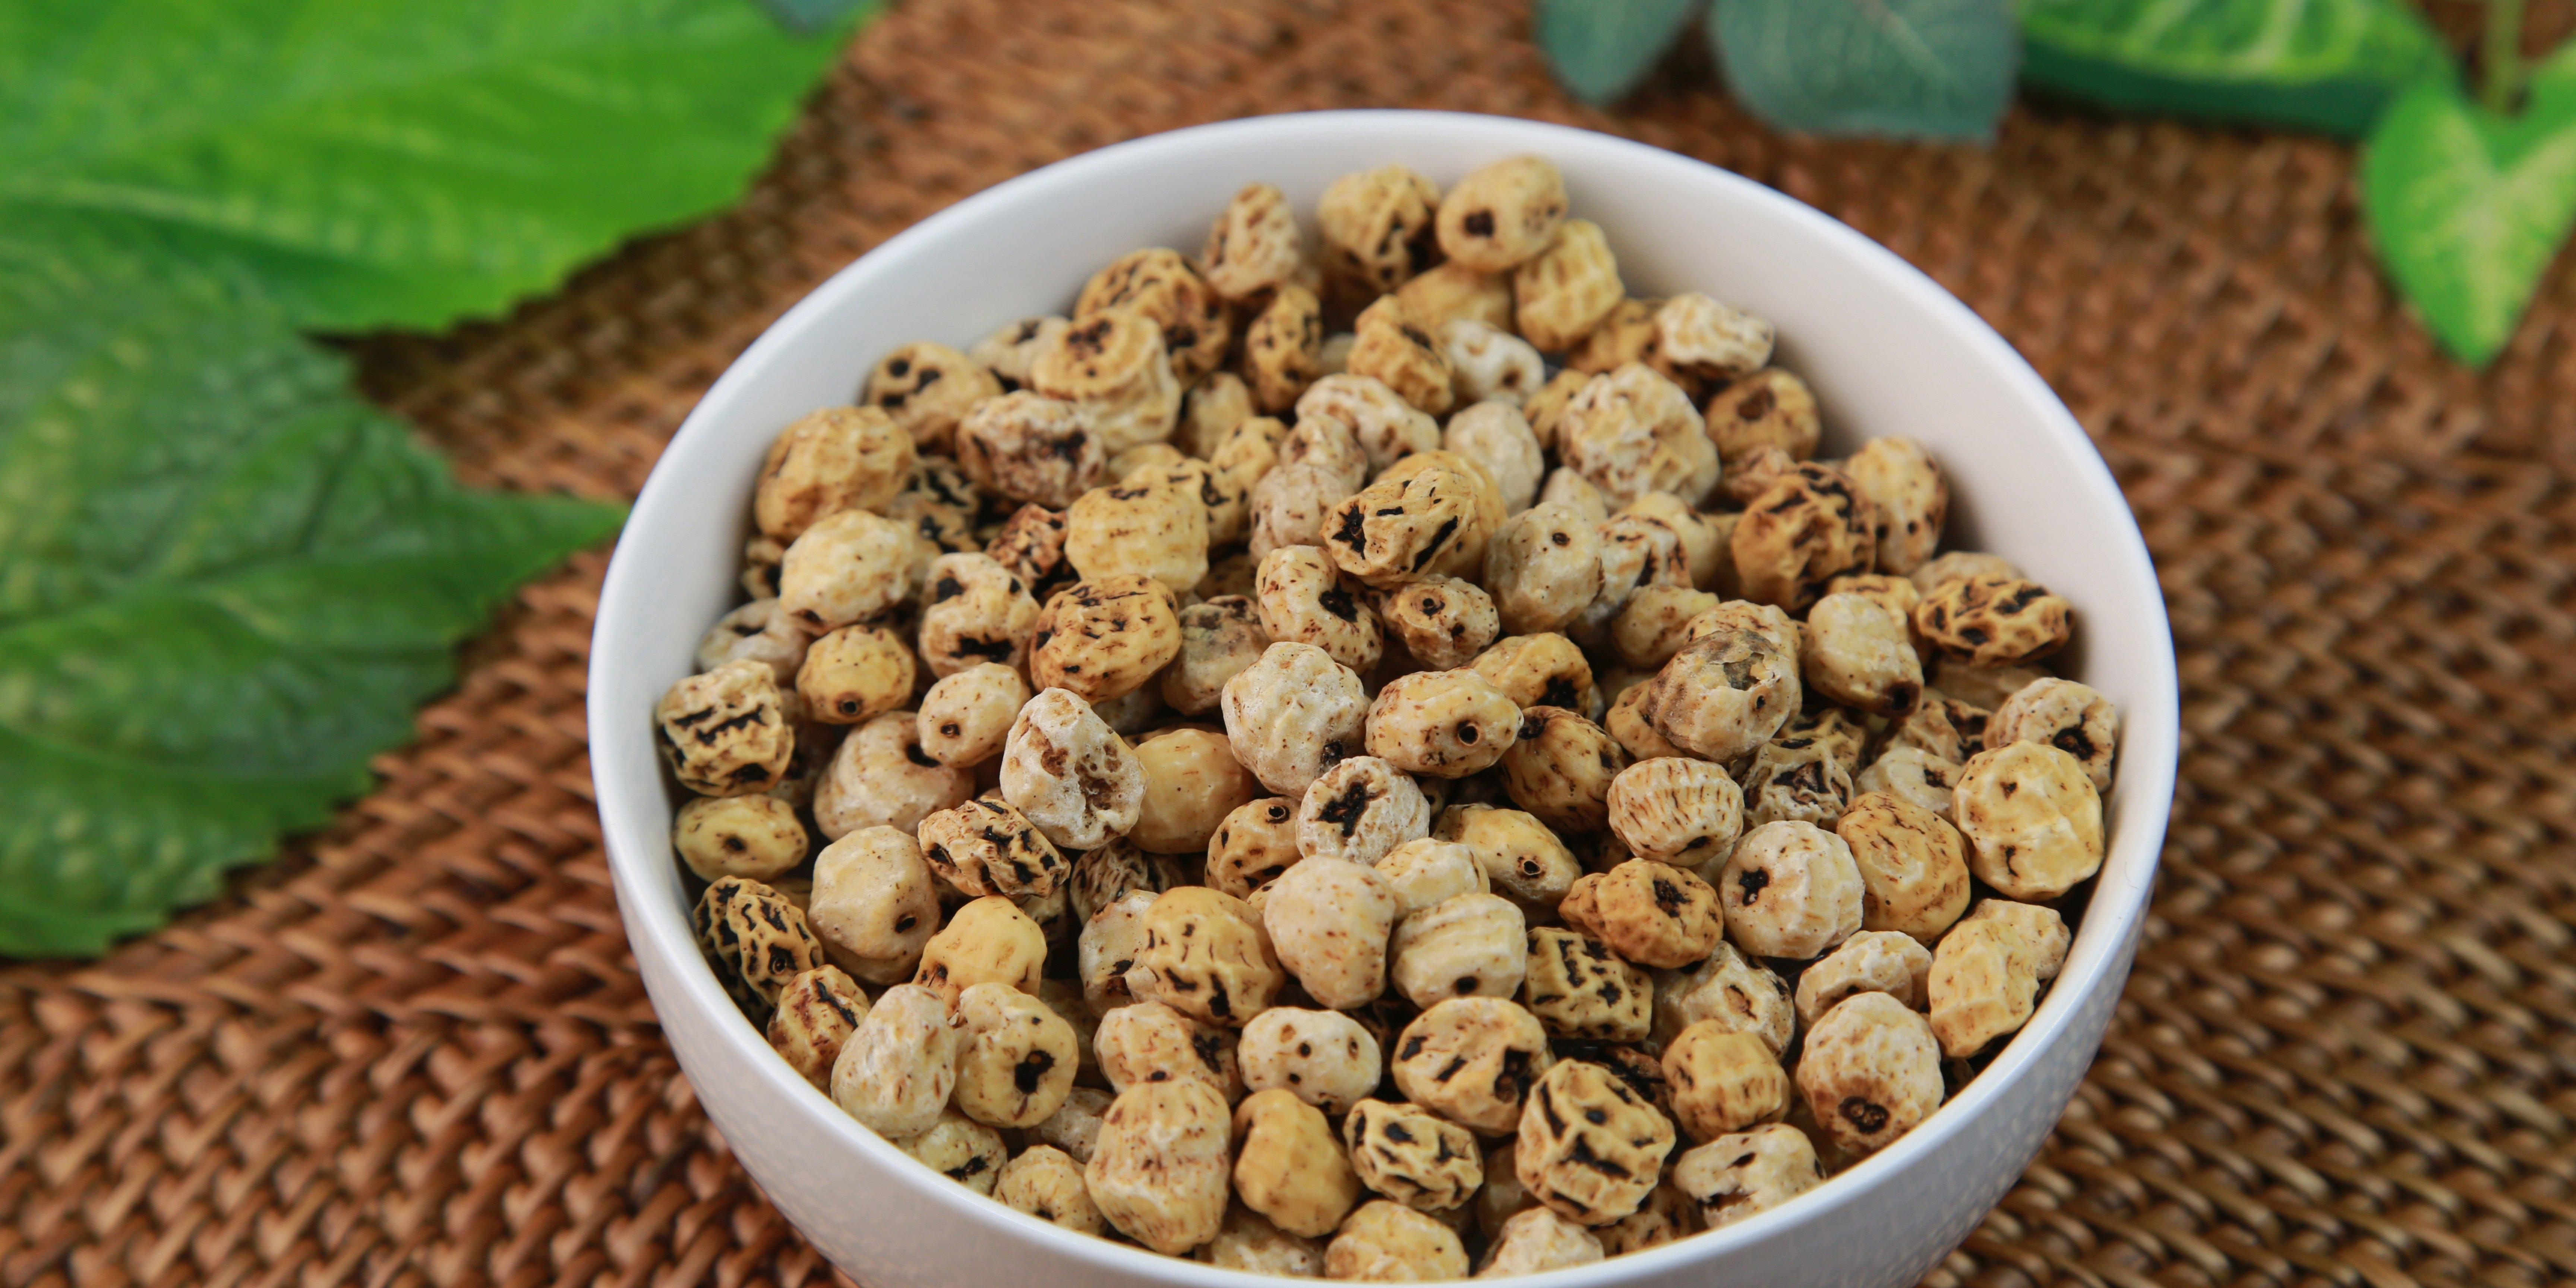 Assuaged-Tigernuts-In-Bowl-Image